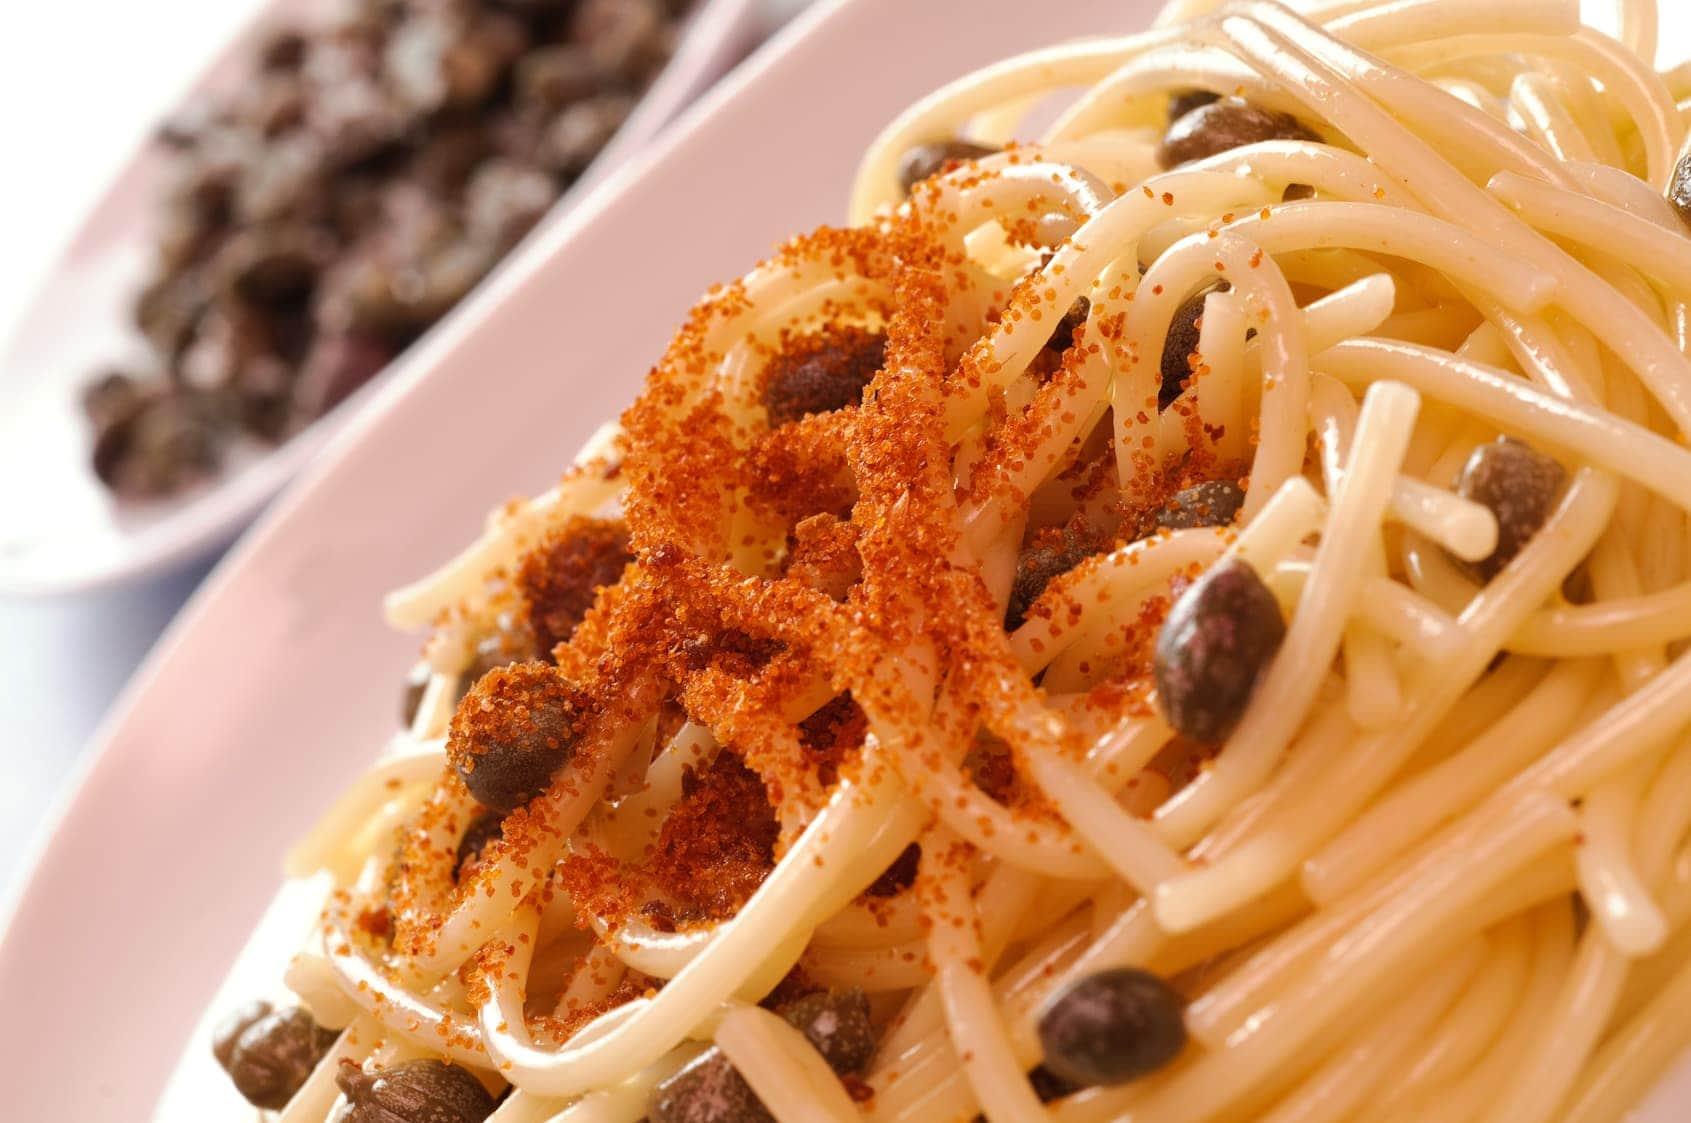 Spaghetti con bottarga e capperi - what is bottarga